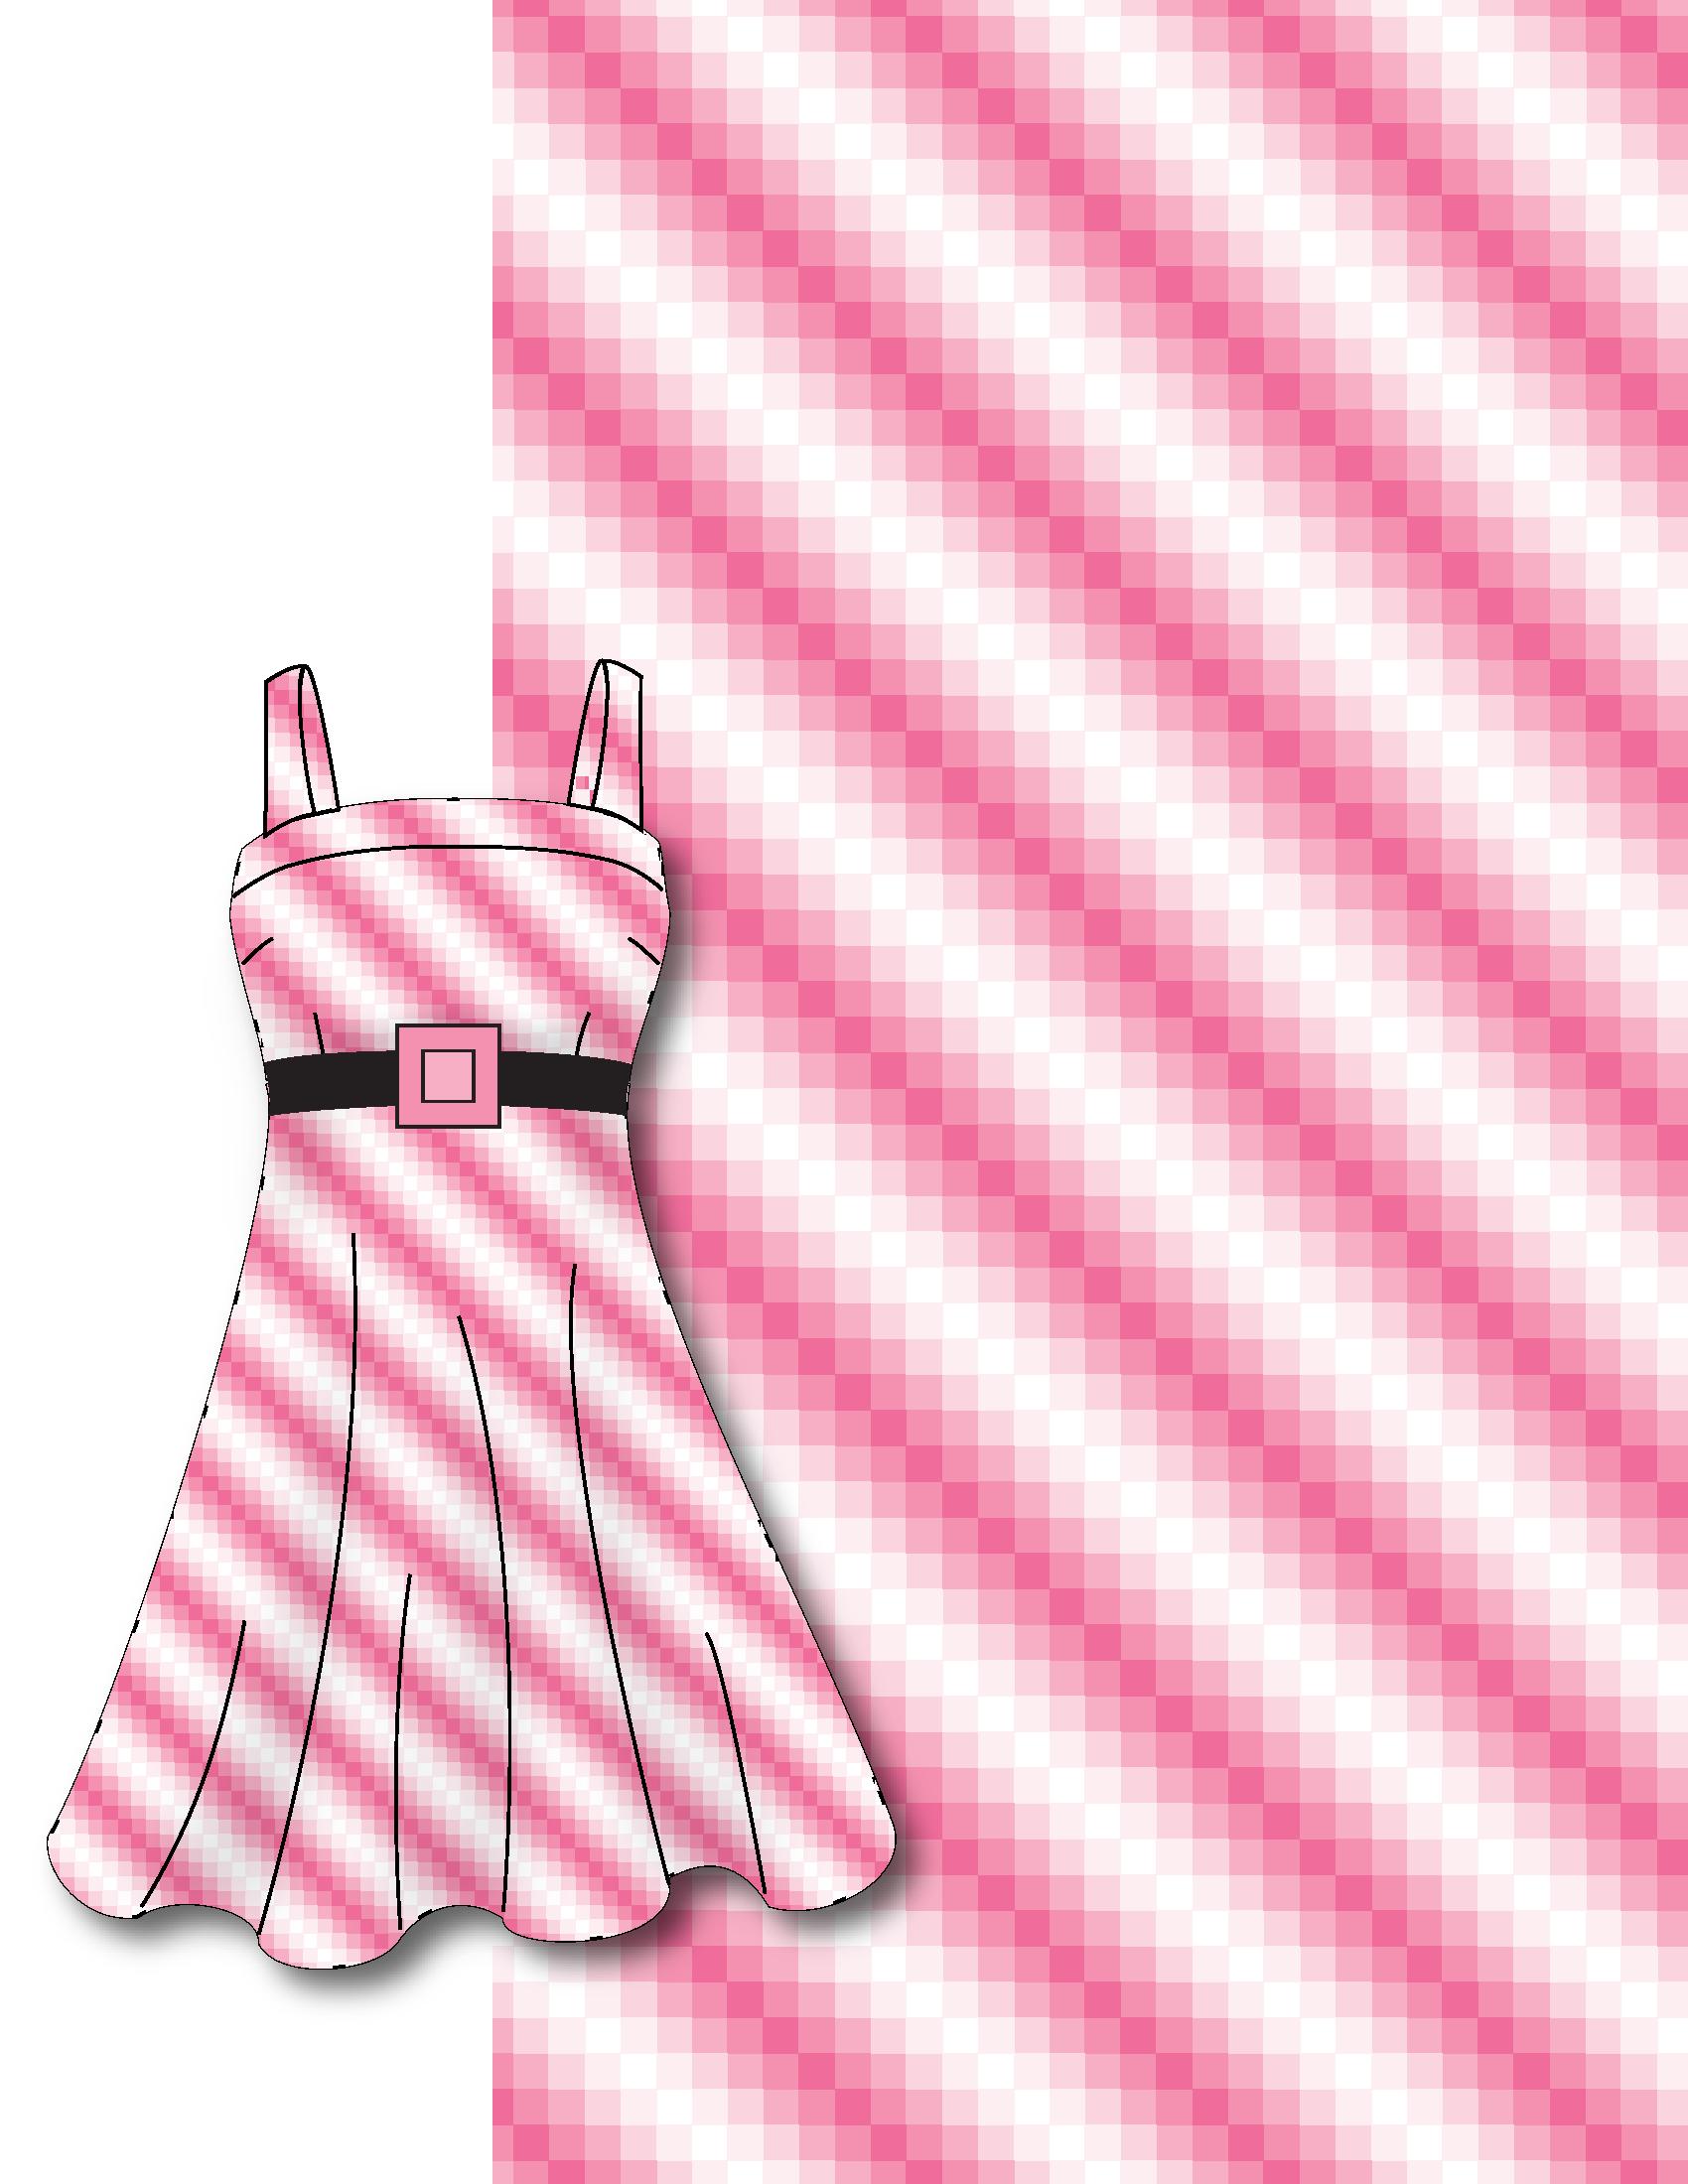 dress_cw2.png